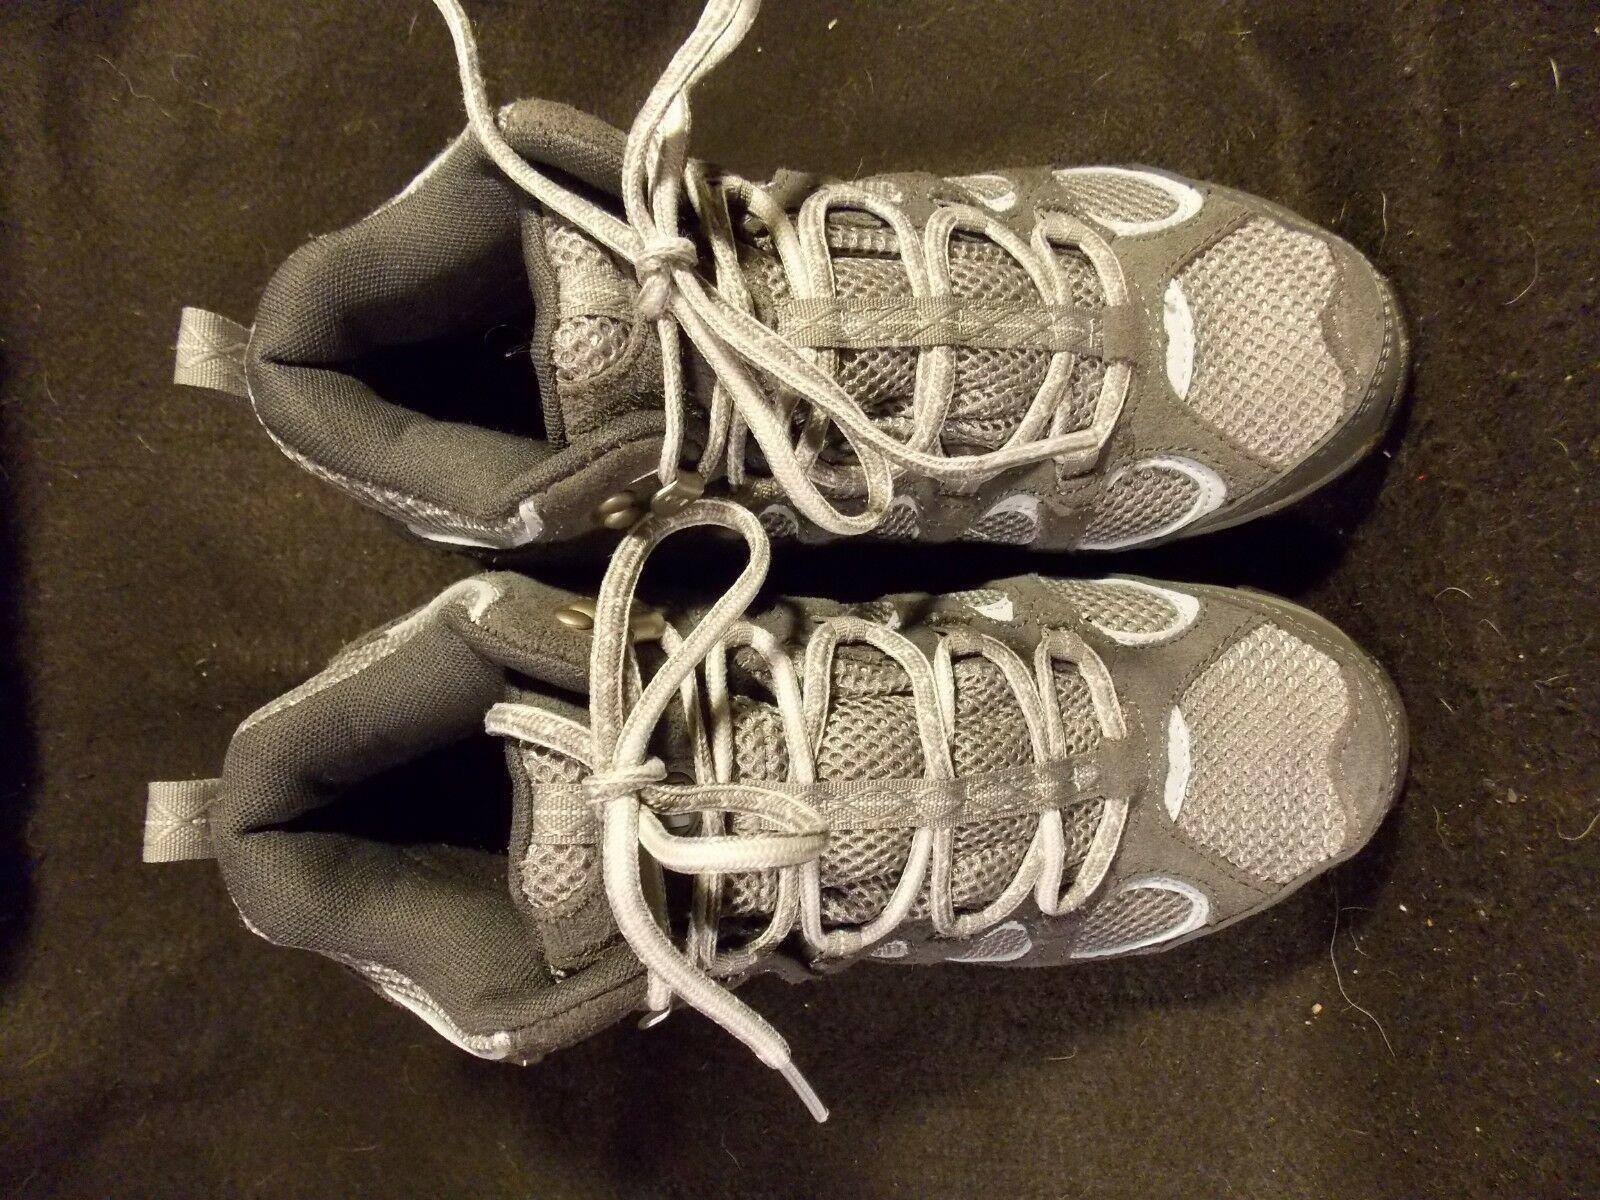 Women's Merrell Hilltop Vent Waterproof Castle Rock Gray Hiking Shoes Size 6 image 7